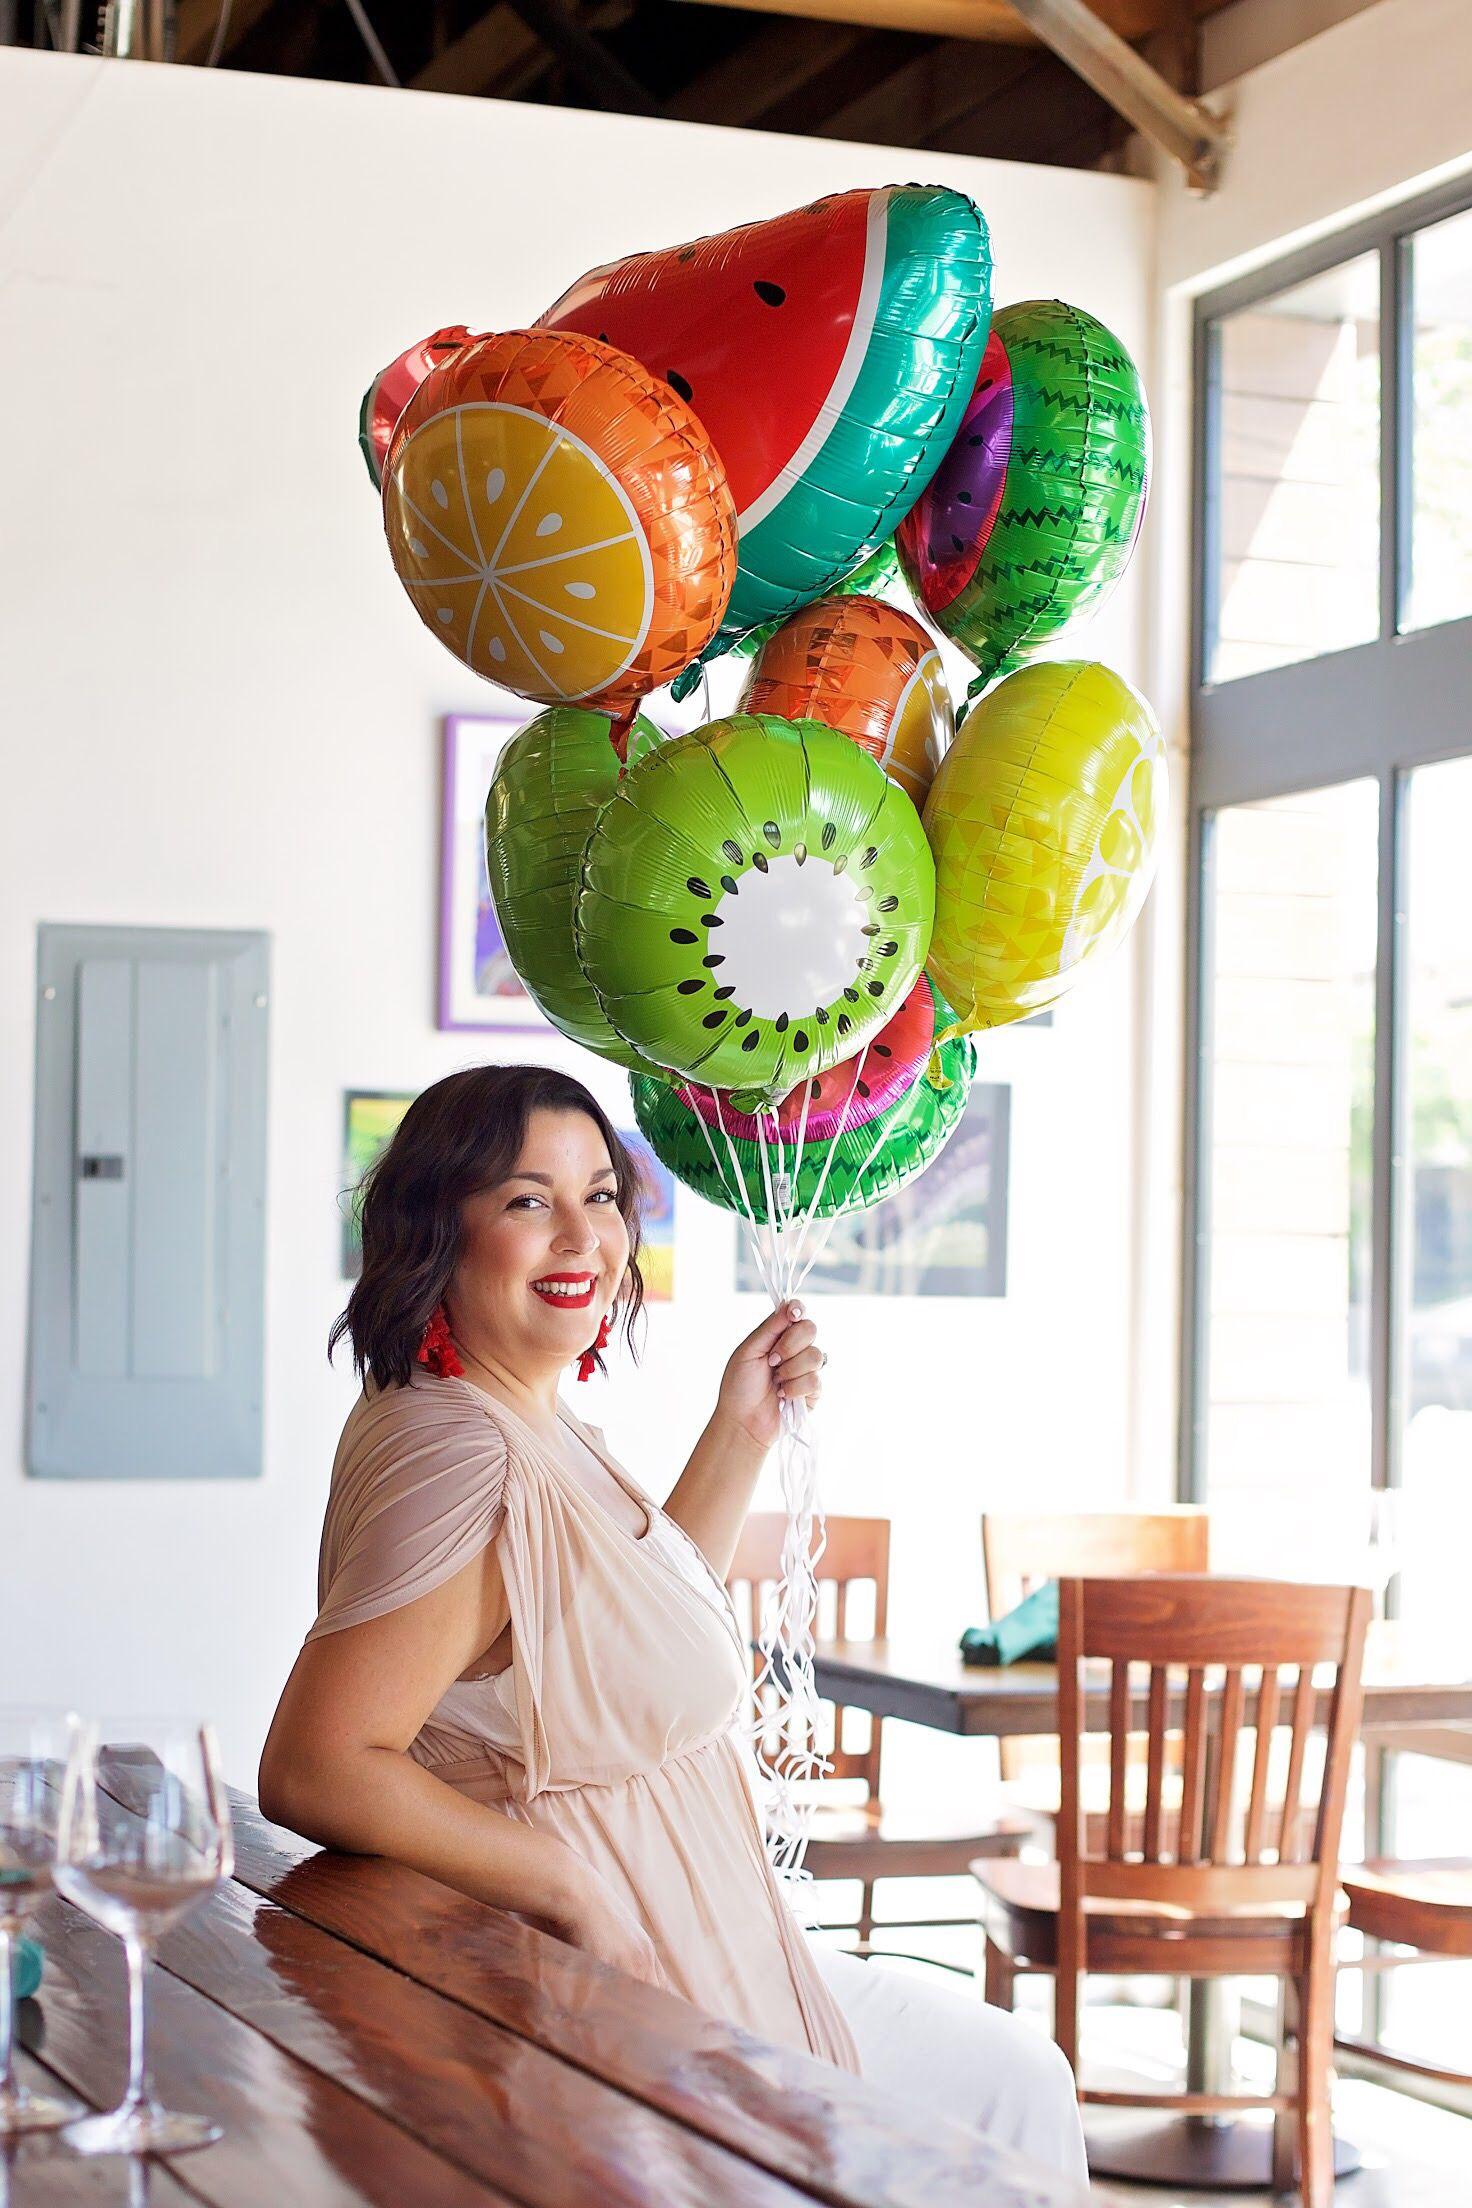 Owner + Creative Director of La Jolie Fête balloons